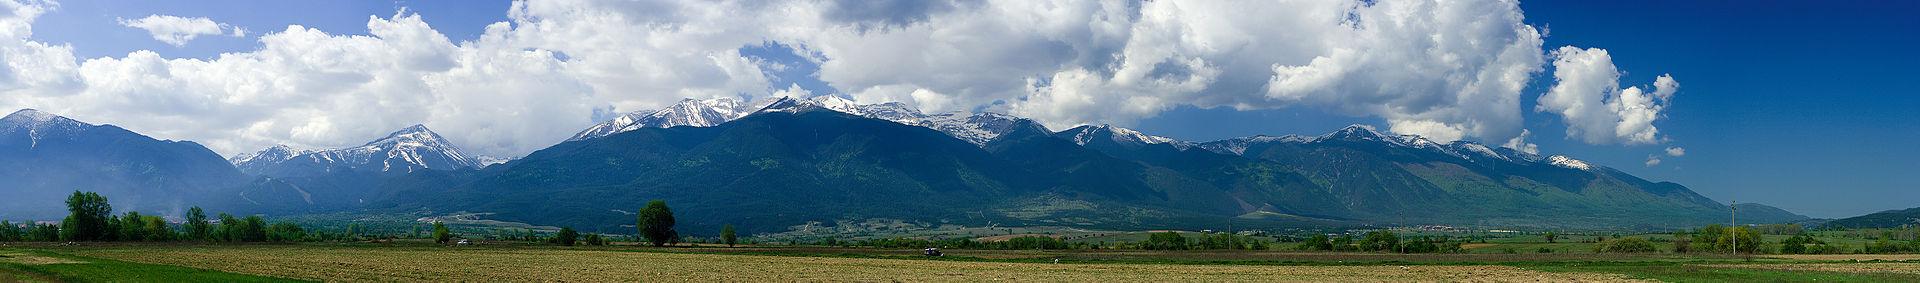 Панорама Пирина. Болгария. Купить горящий тур в Болгарию . http://gela.in.ua